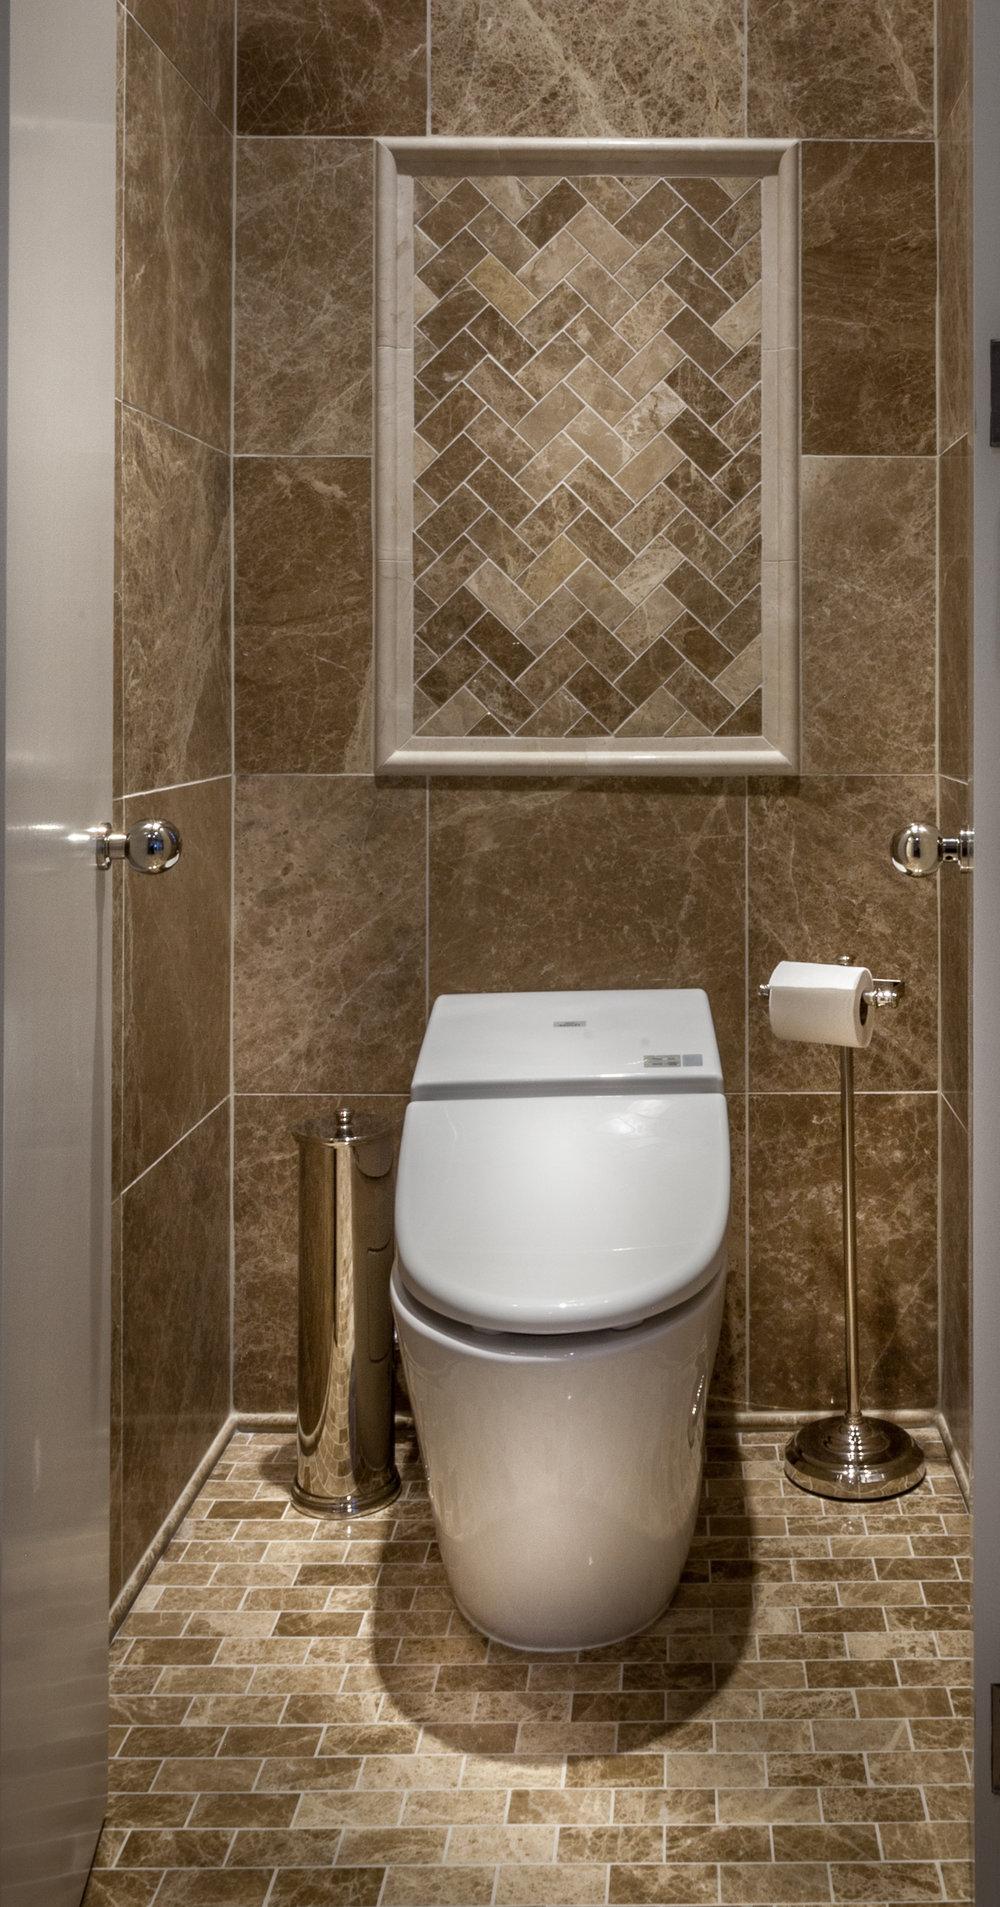 ARNOLD Toilet.jpg